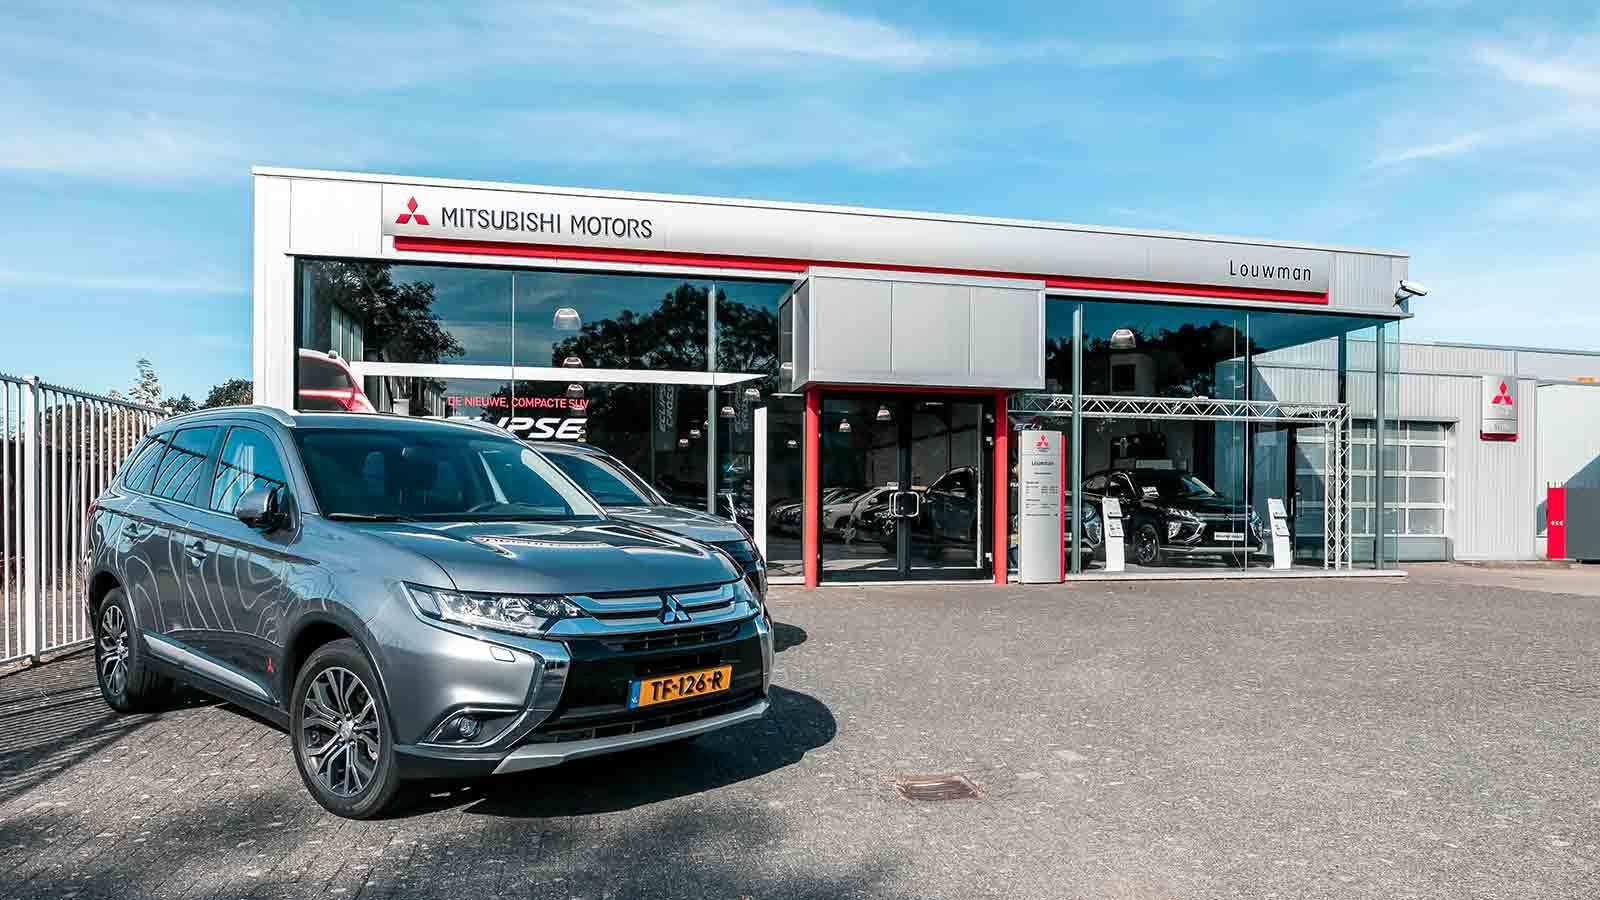 Louwman Mitsubishi Bergen op Zoom